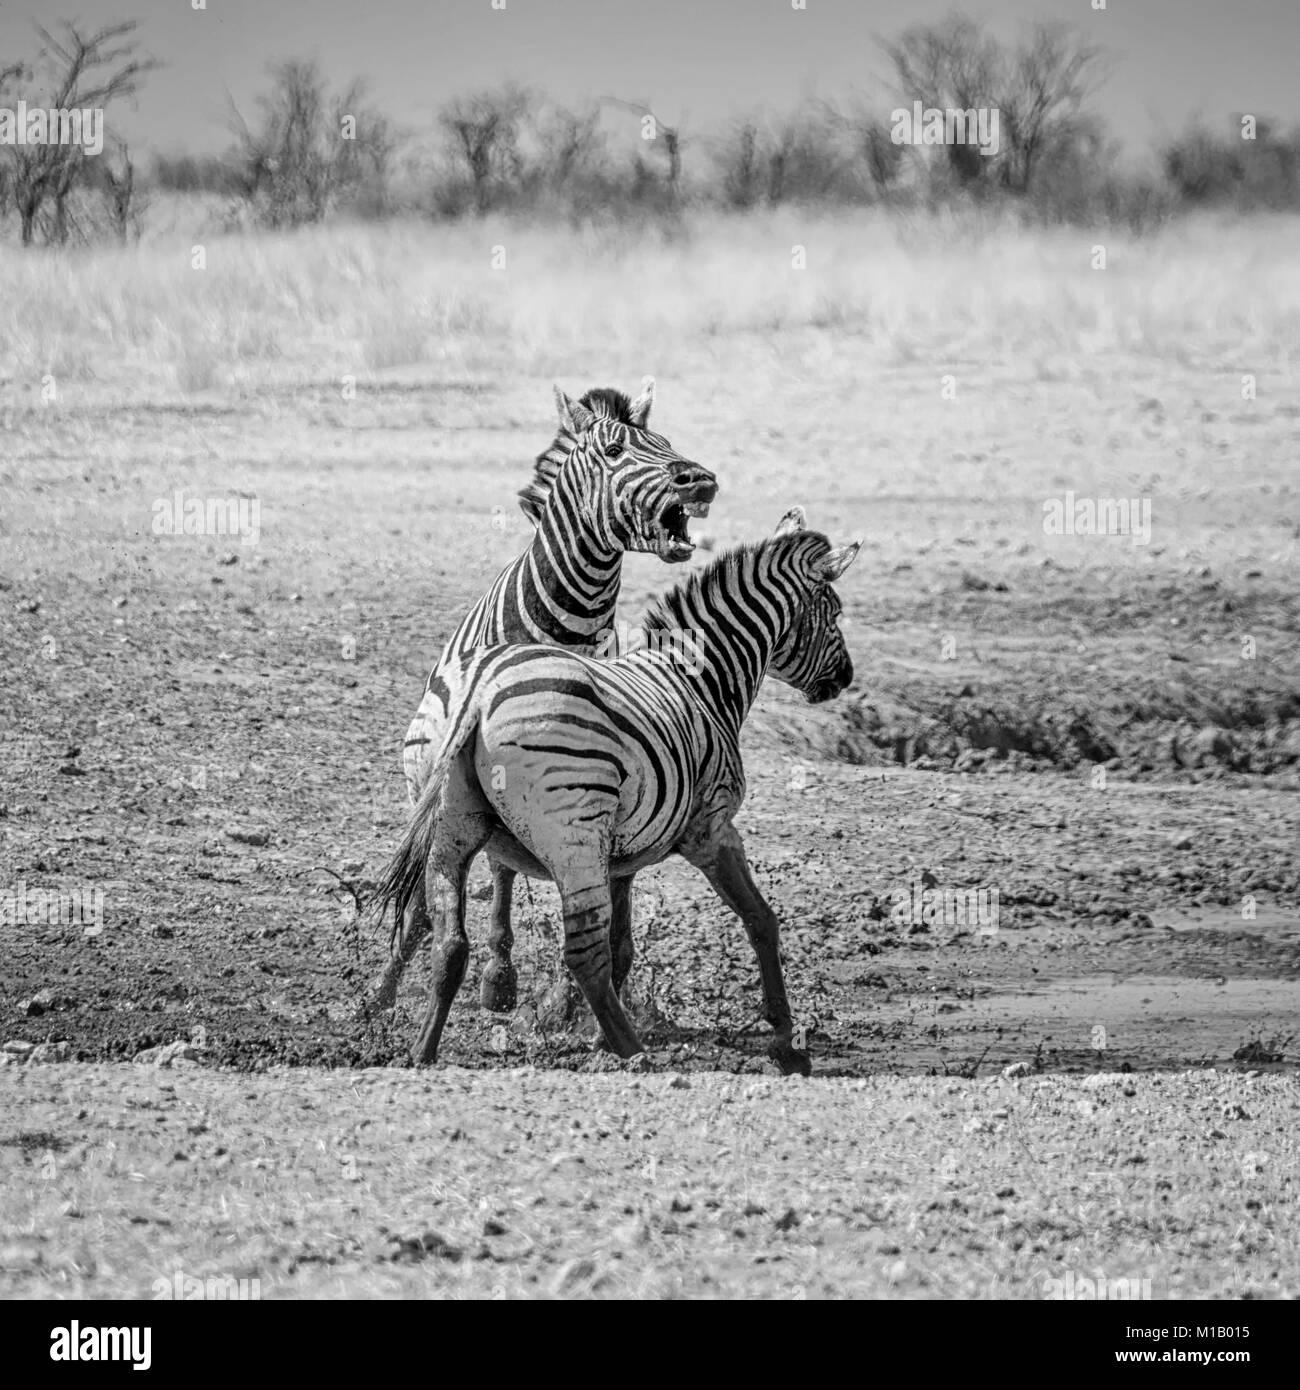 Zebra stallions fighting in the Namibian savanna - Stock Image